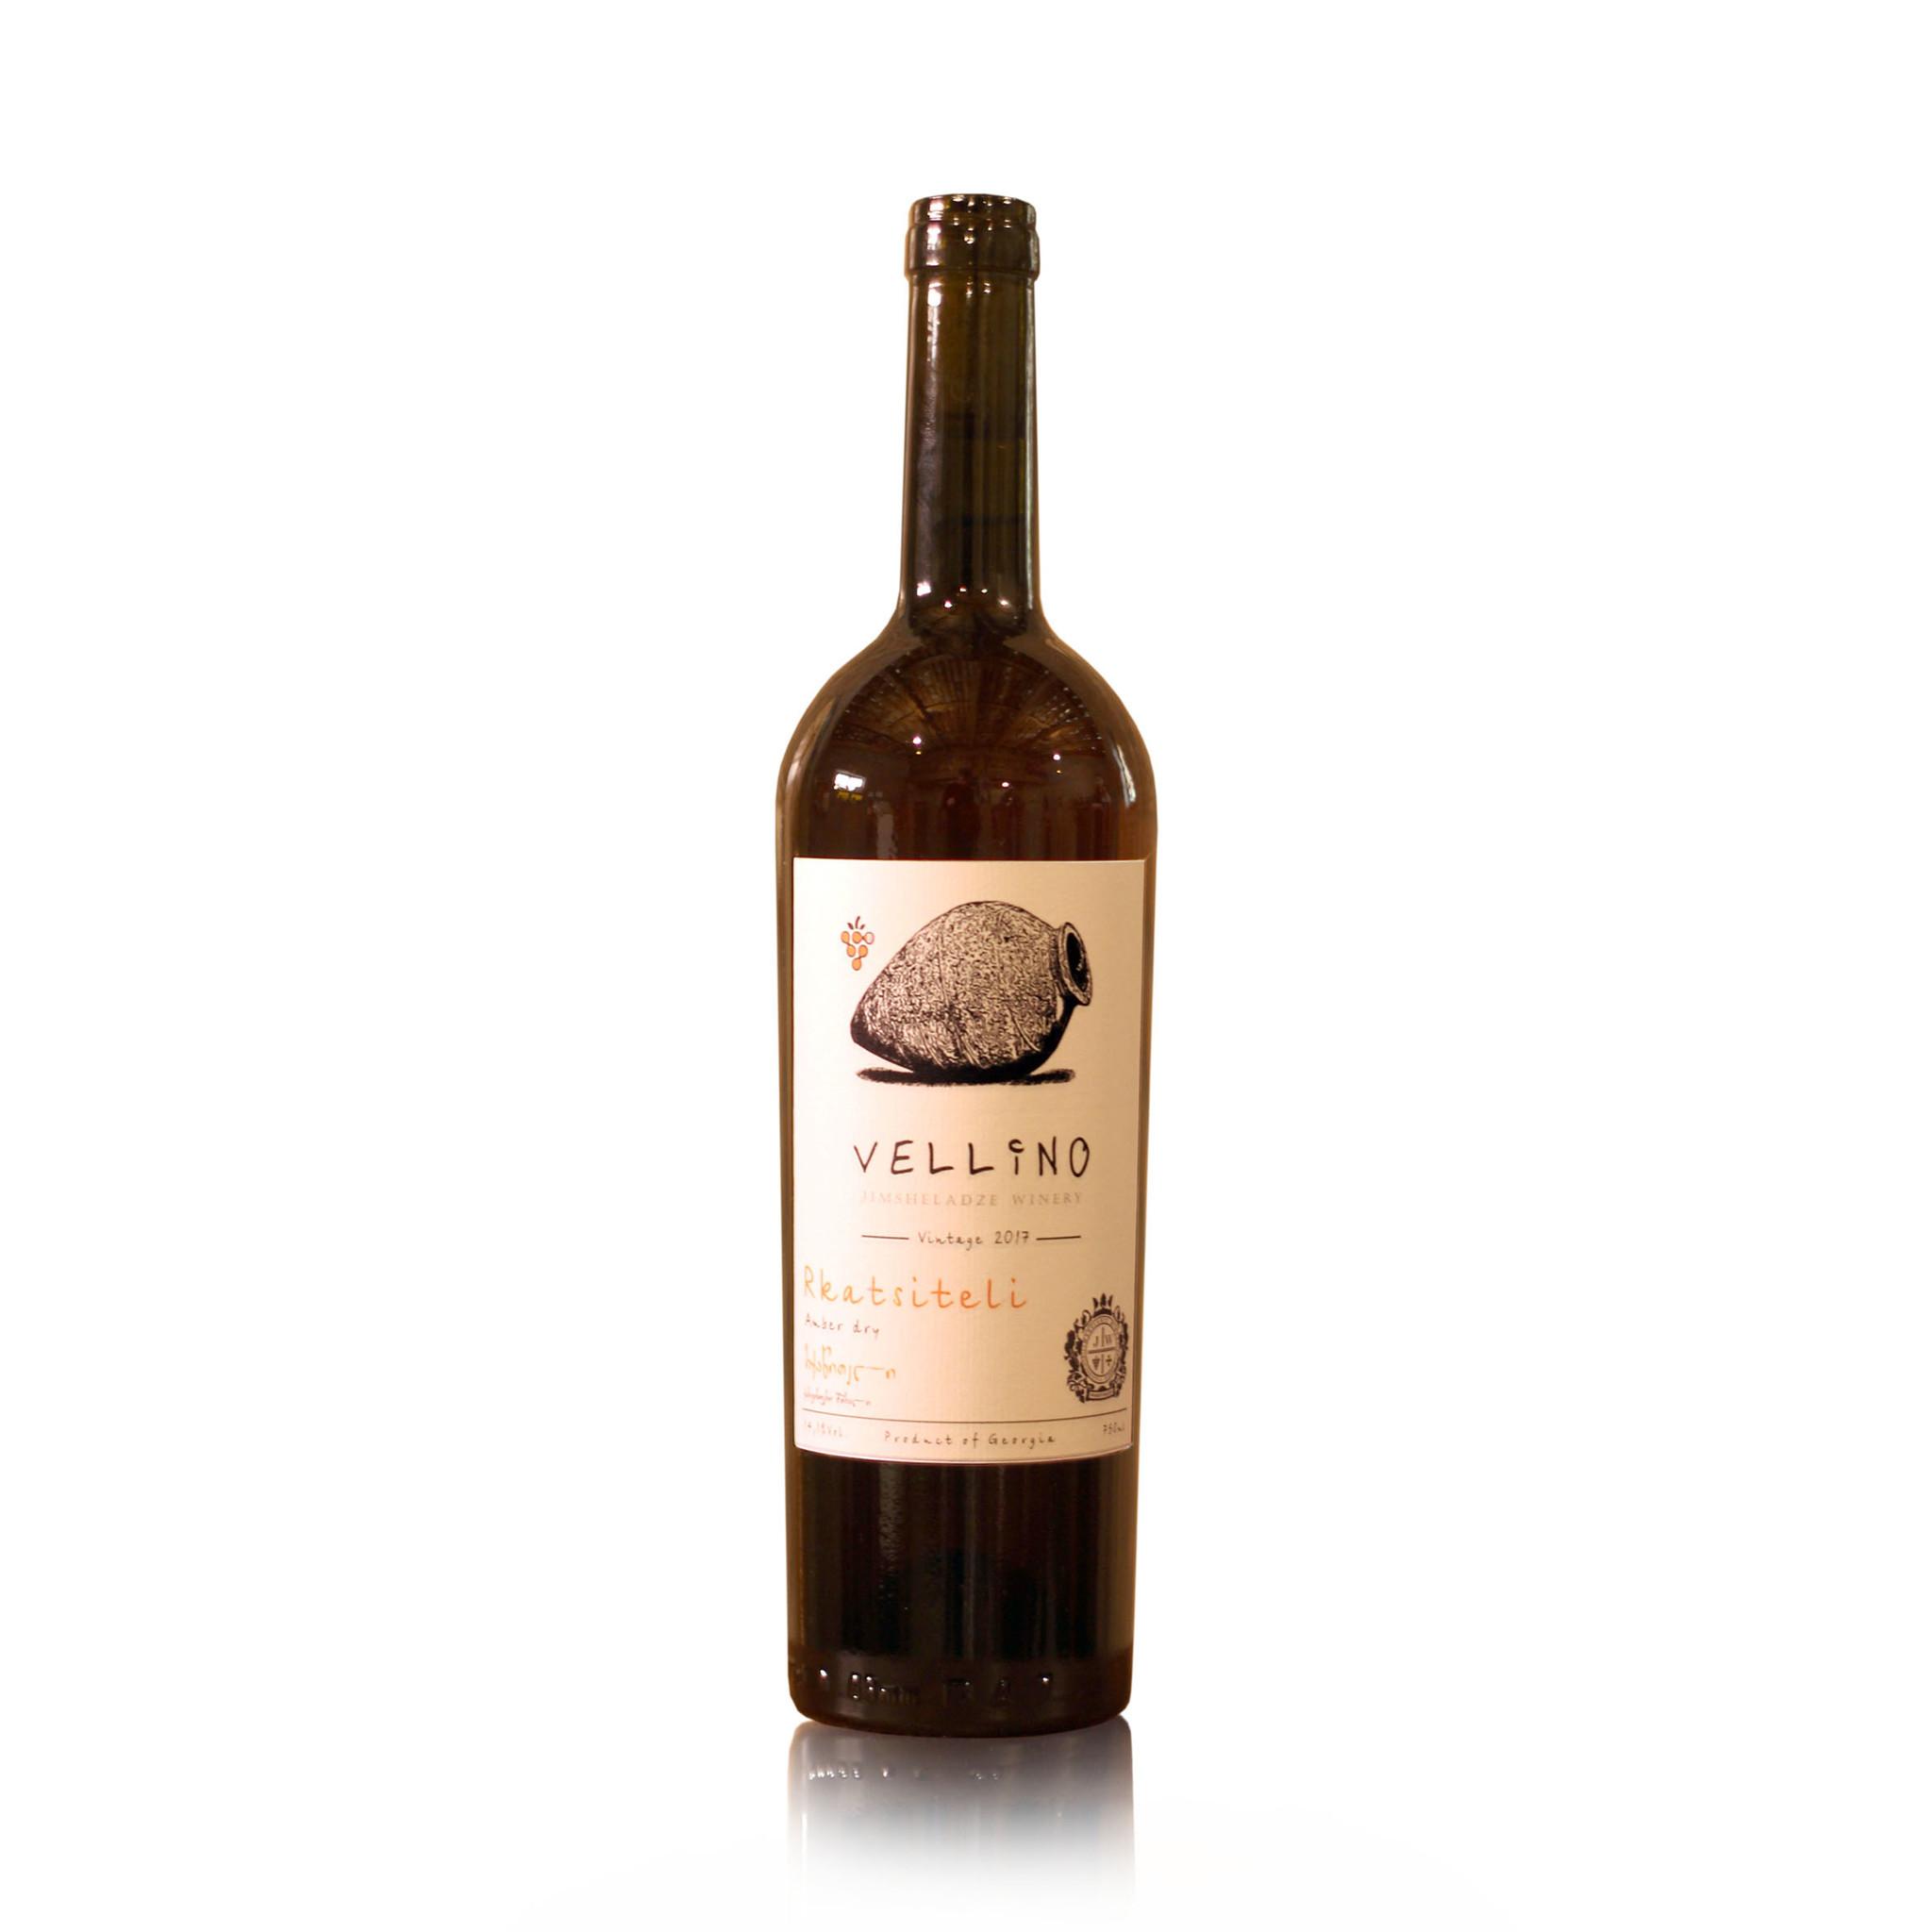 Merk Vellino Vellino Rkatsiteli, Amber-droog Qvevri wijn